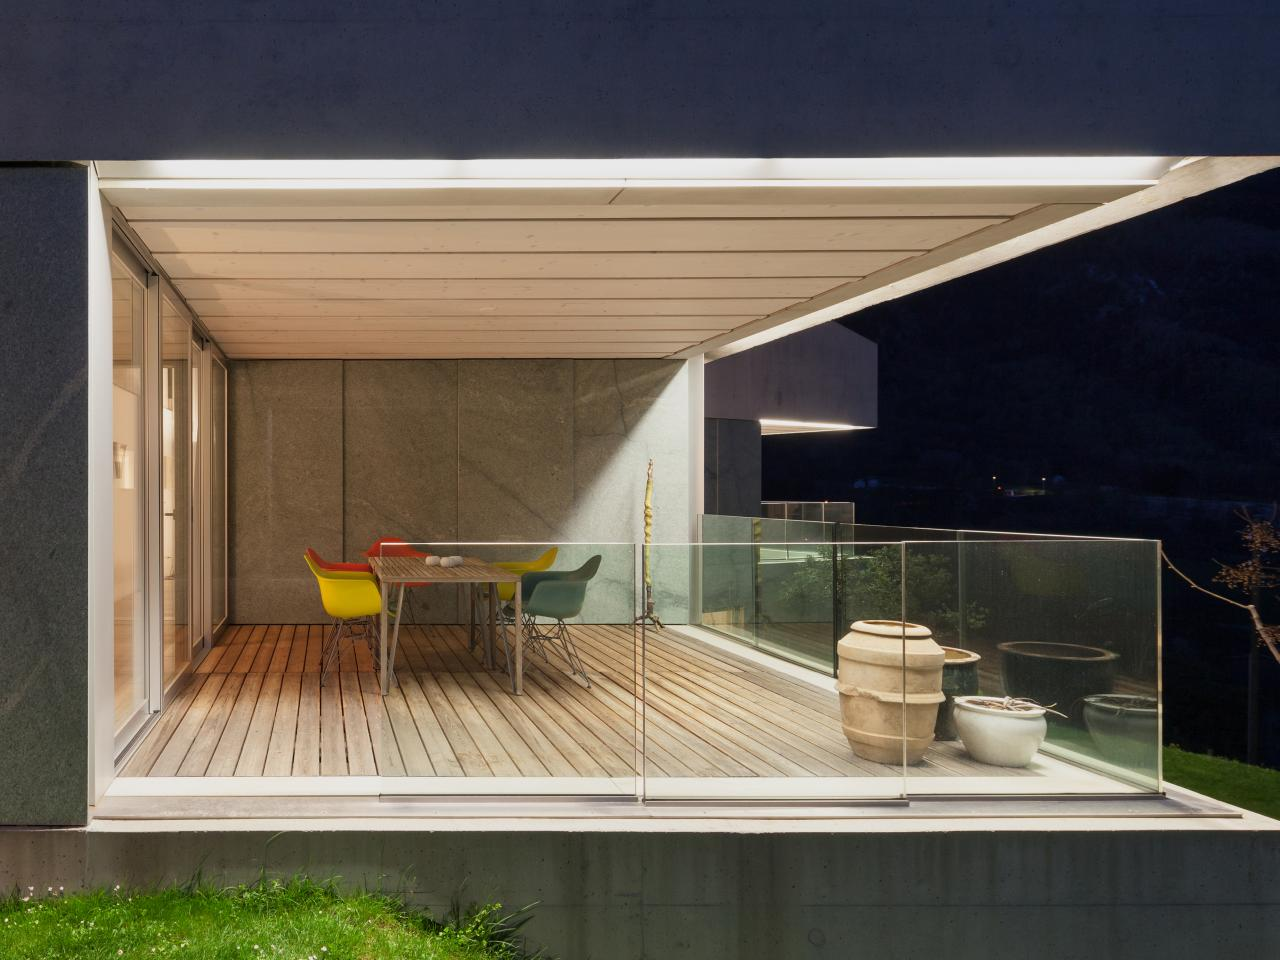 glas br stung nach ma glasprofi24. Black Bedroom Furniture Sets. Home Design Ideas